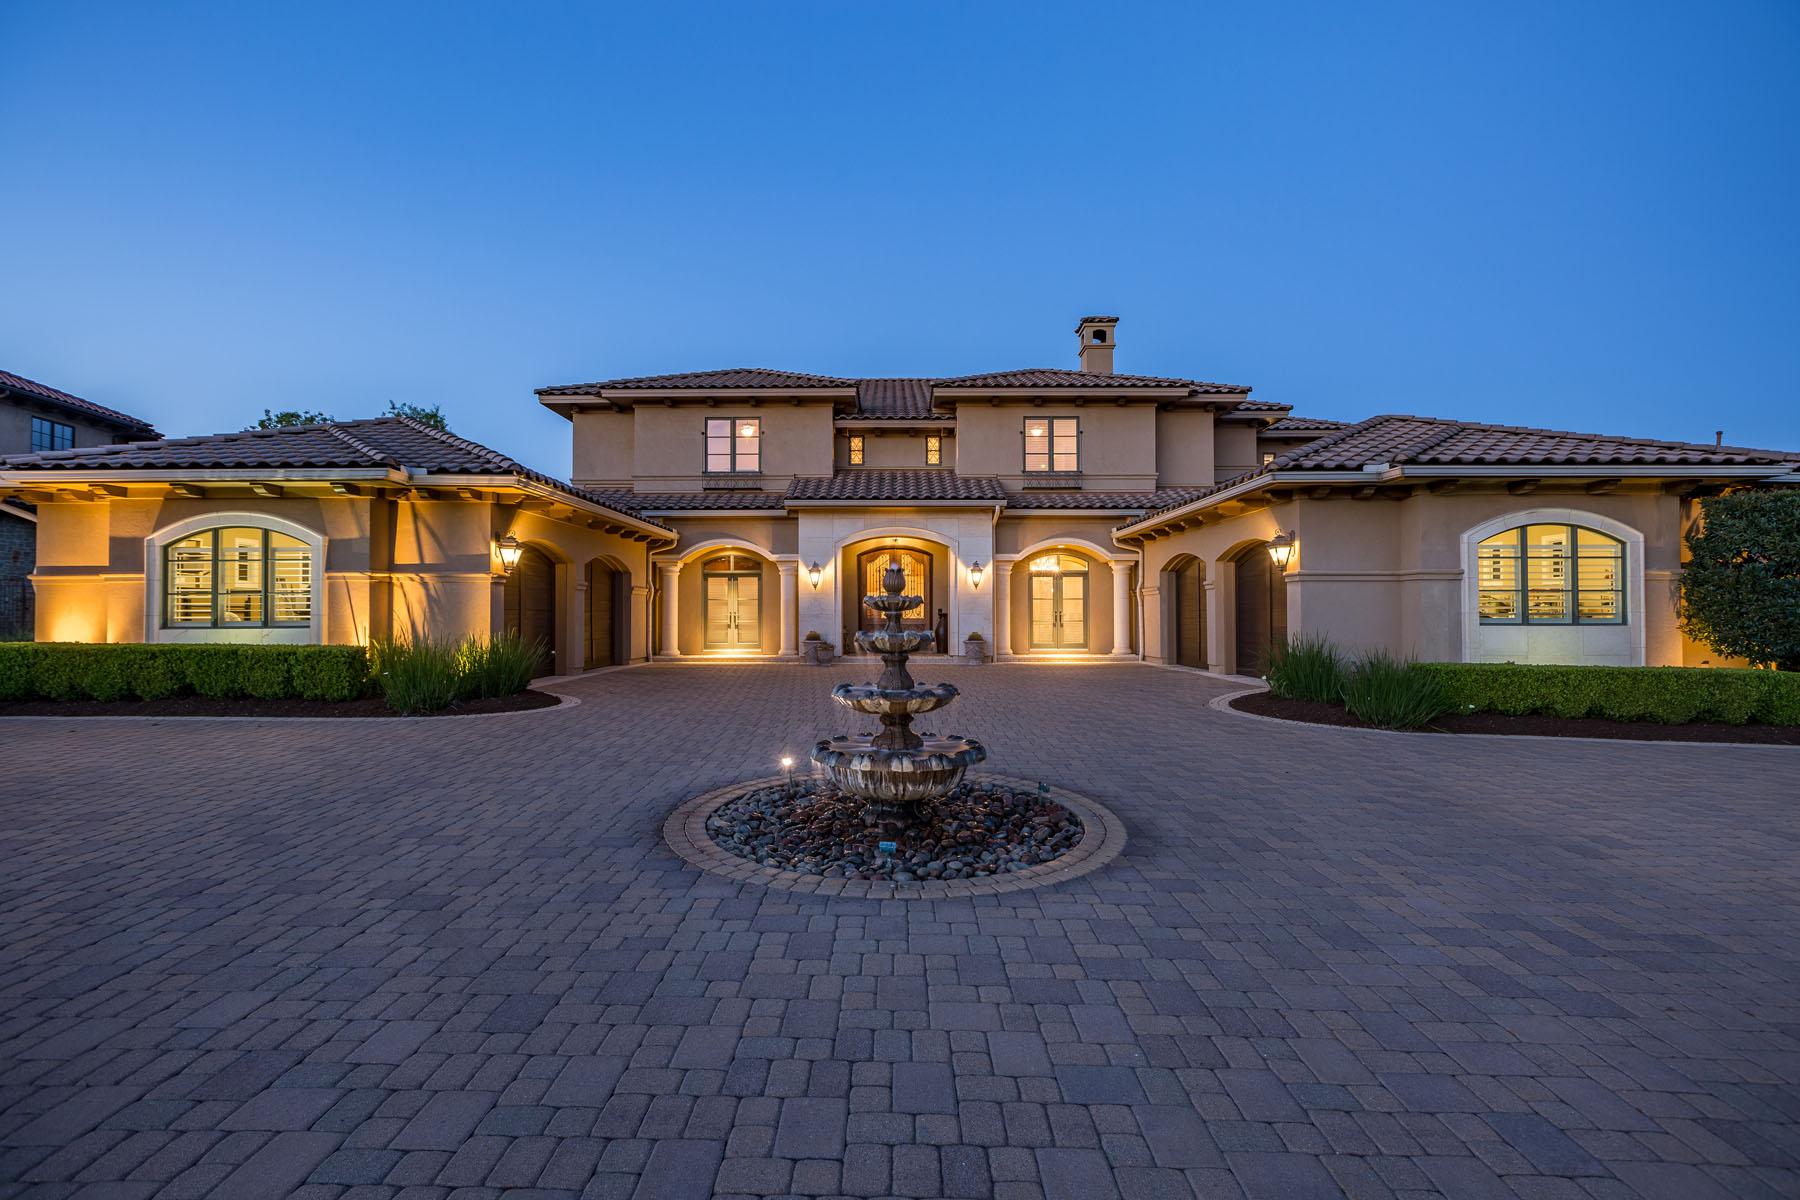 Single Family Home for Sale at Desirable Barton Creek Estate 8416 Calera Dr Austin, Texas, 78735 United States